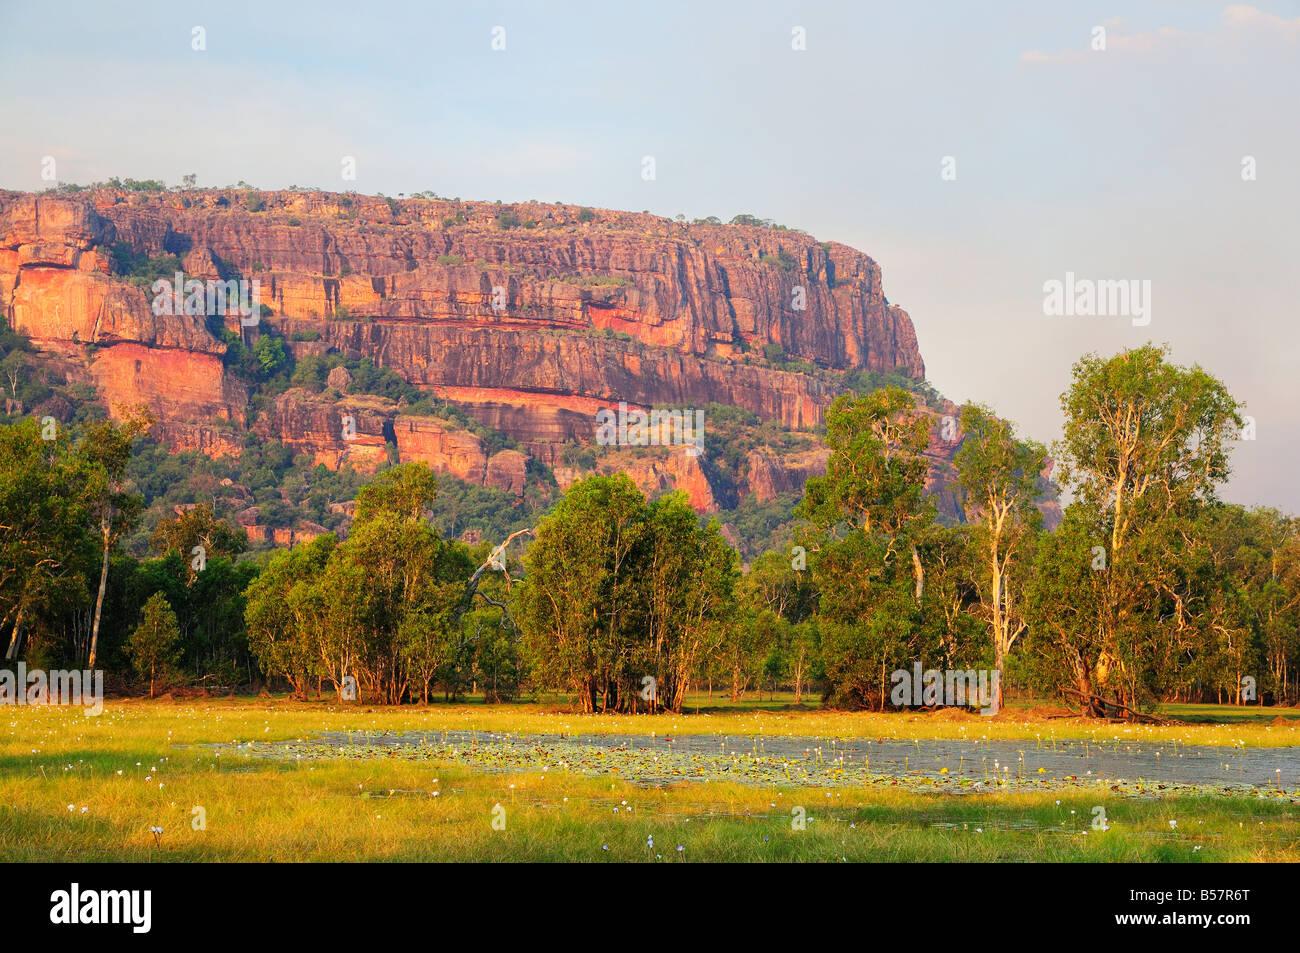 Nourlangie Rock and Anbangbang Billabong, Kakadu National Park, UNESCO World Heritage Site, Northern Territory, - Stock Image